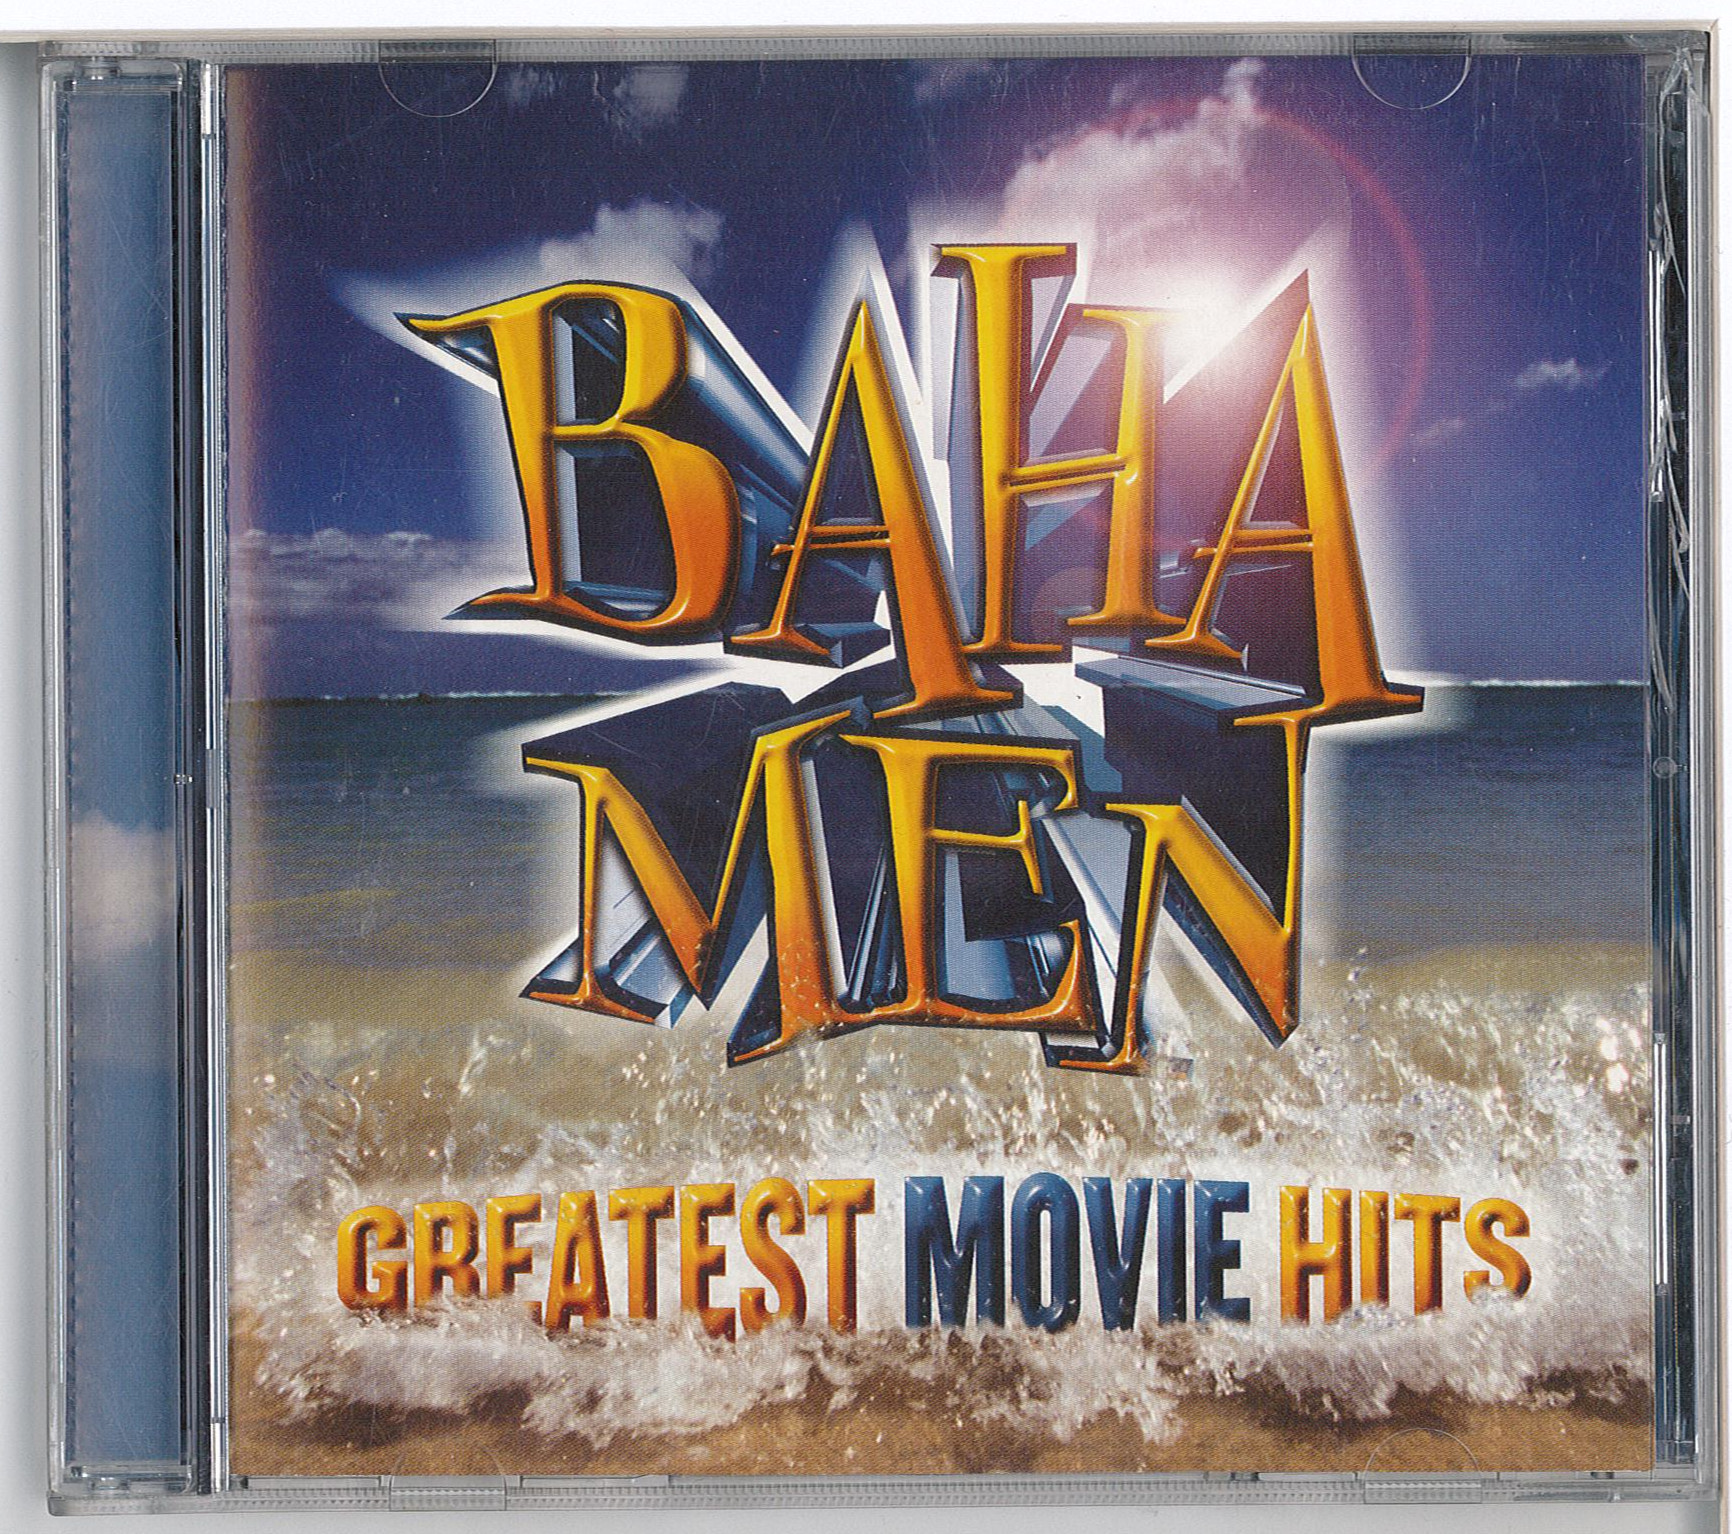 WLWLTDOO-2002-CD-BAHA-MEN-MOVIE-HITS-US-FRONT.jpg